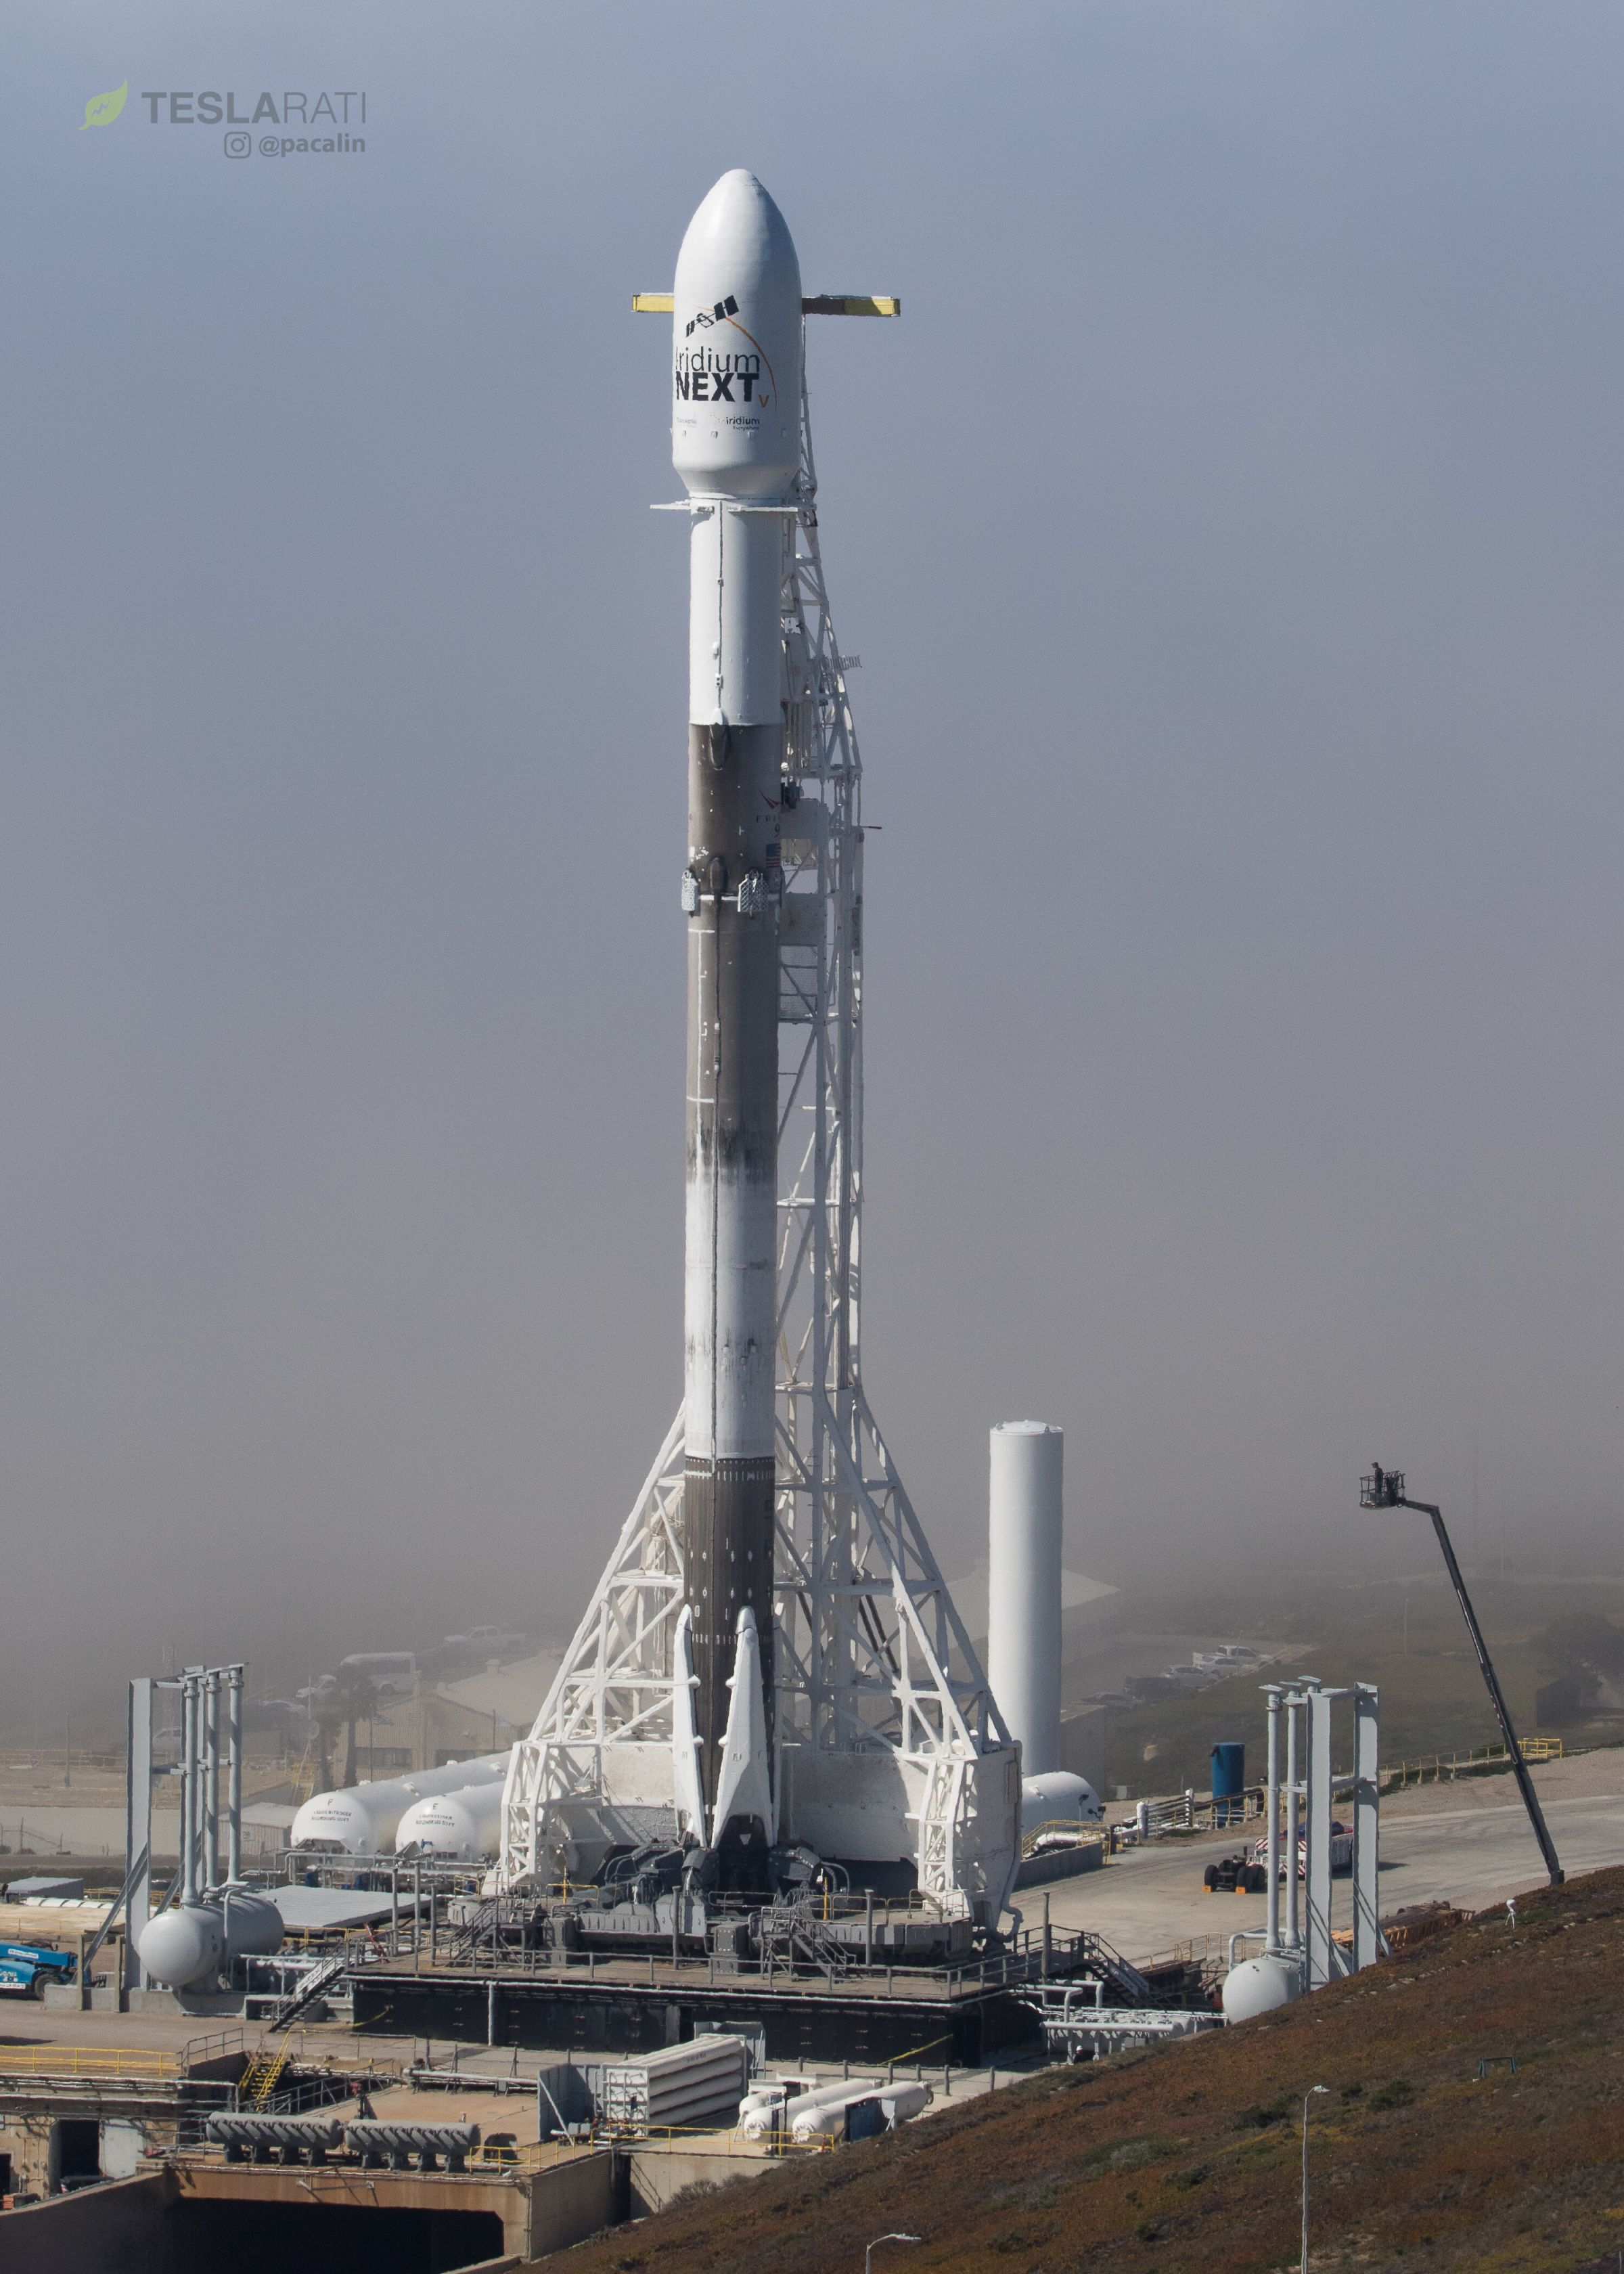 Truck Sound System >> Falcon 9 1041 2 (Pauline Acalin)(c) - TESLARATI